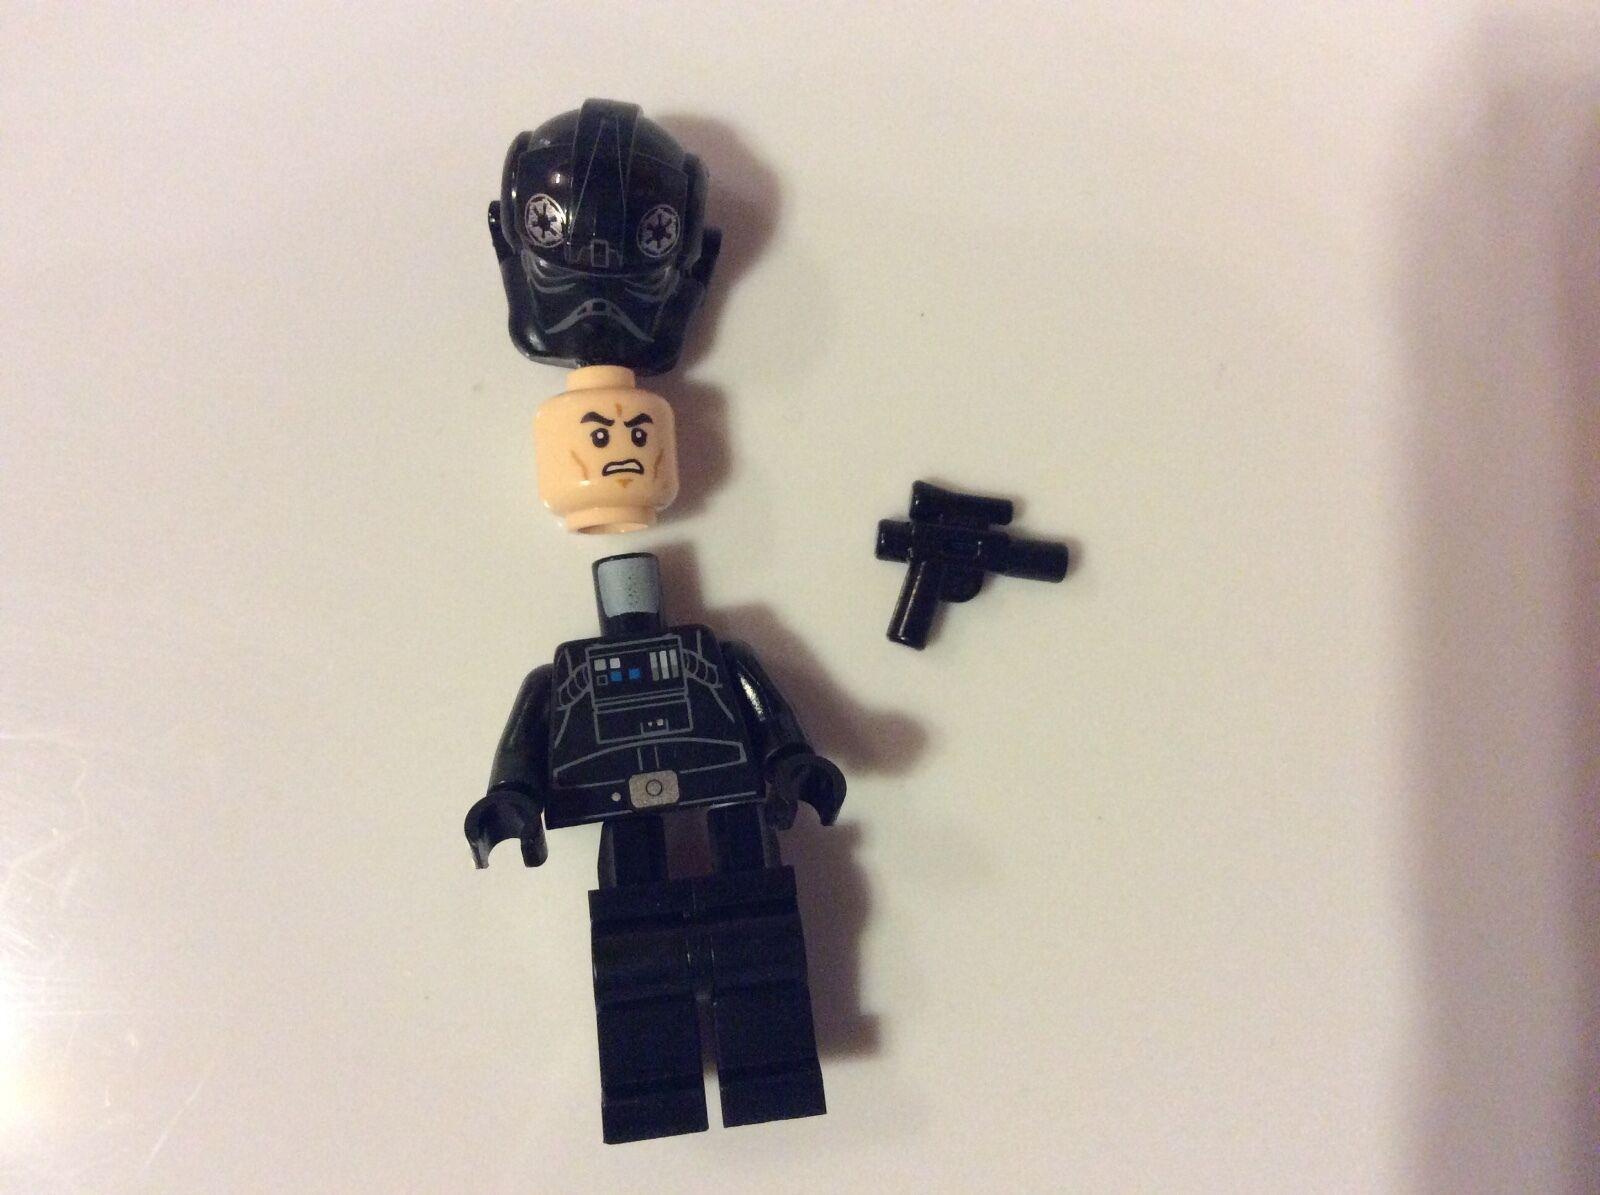 New Tie Lego Star Wars Tie New Pilot Mini Figure From Rebels Set 75106 Imperial Assault c5df1c